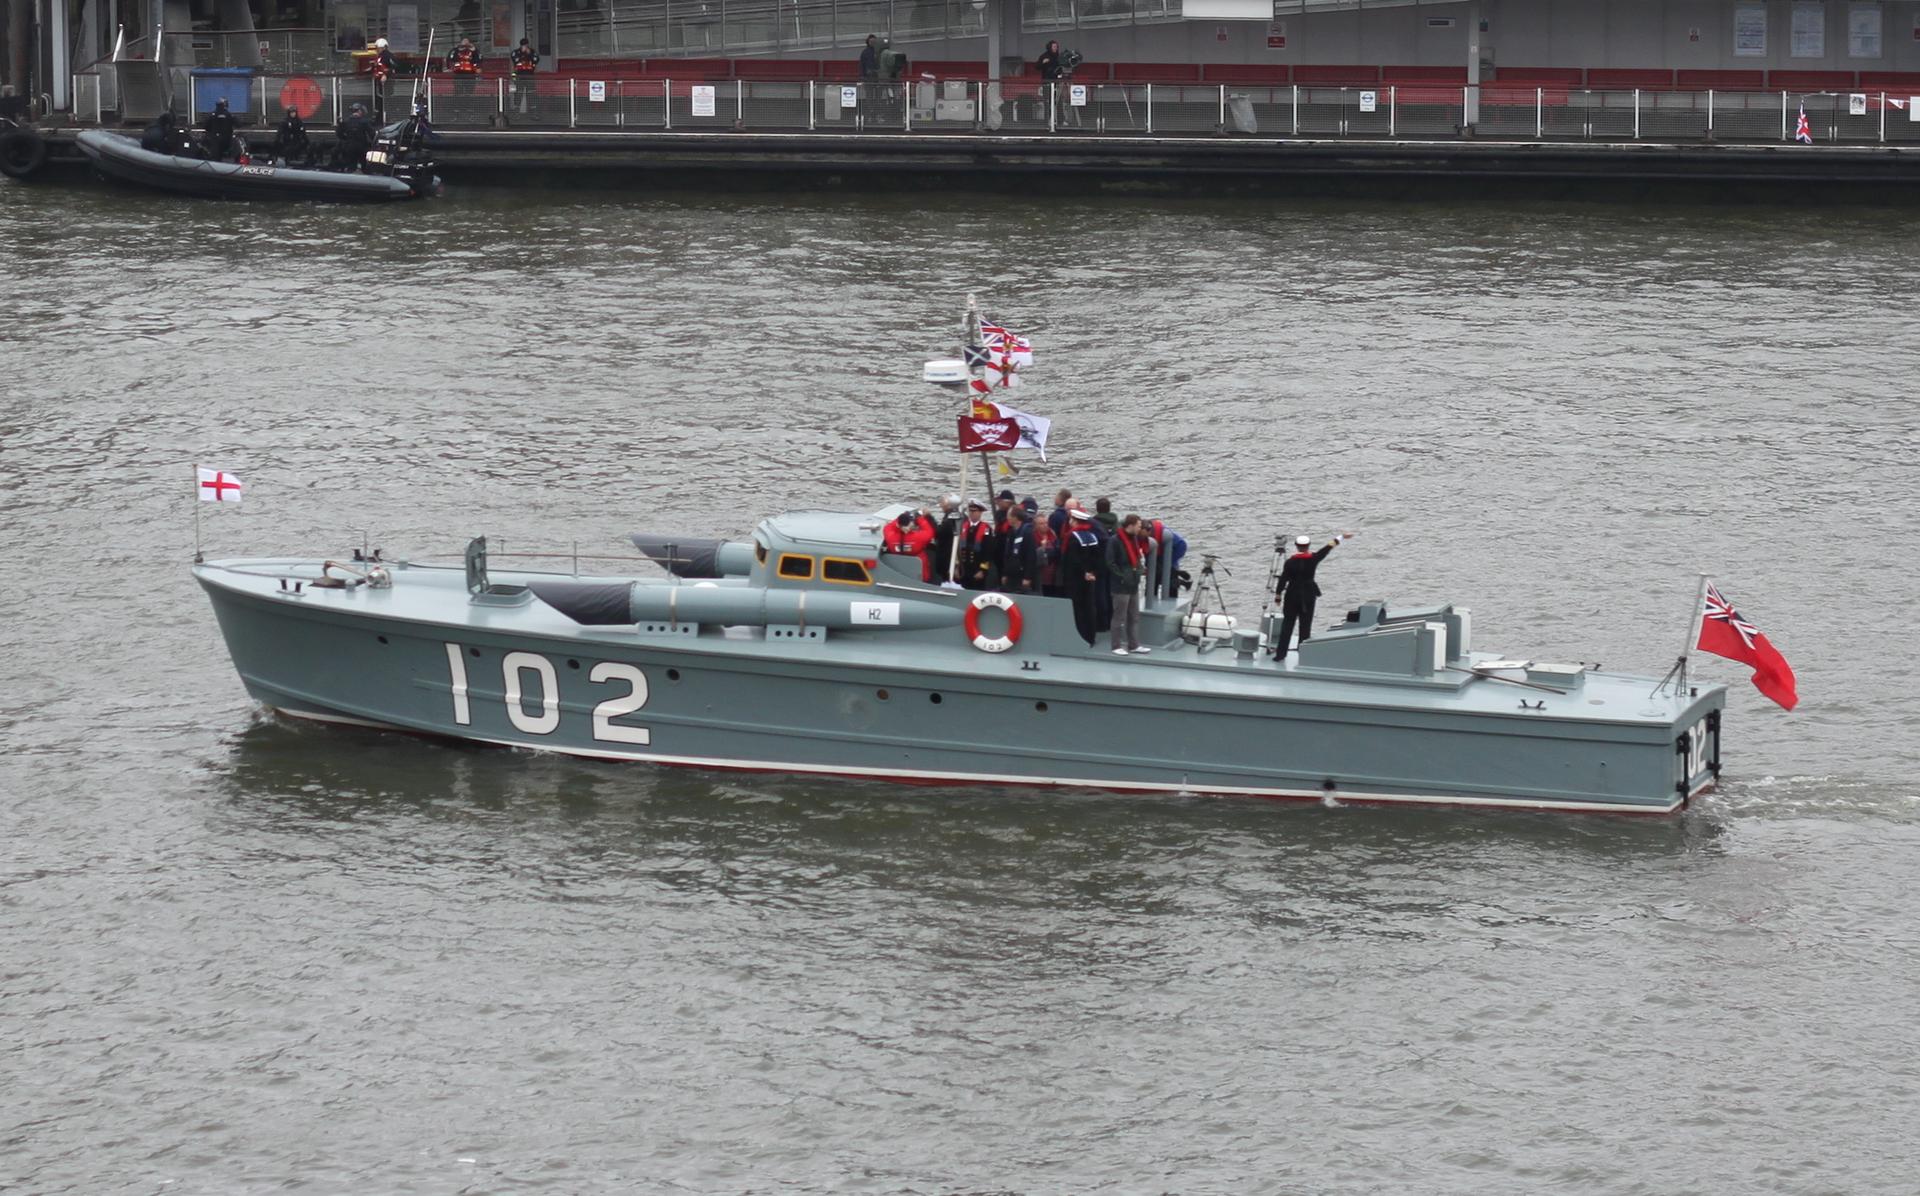 1920px-MTB_102_(Motor_Torpedo_Boat).png